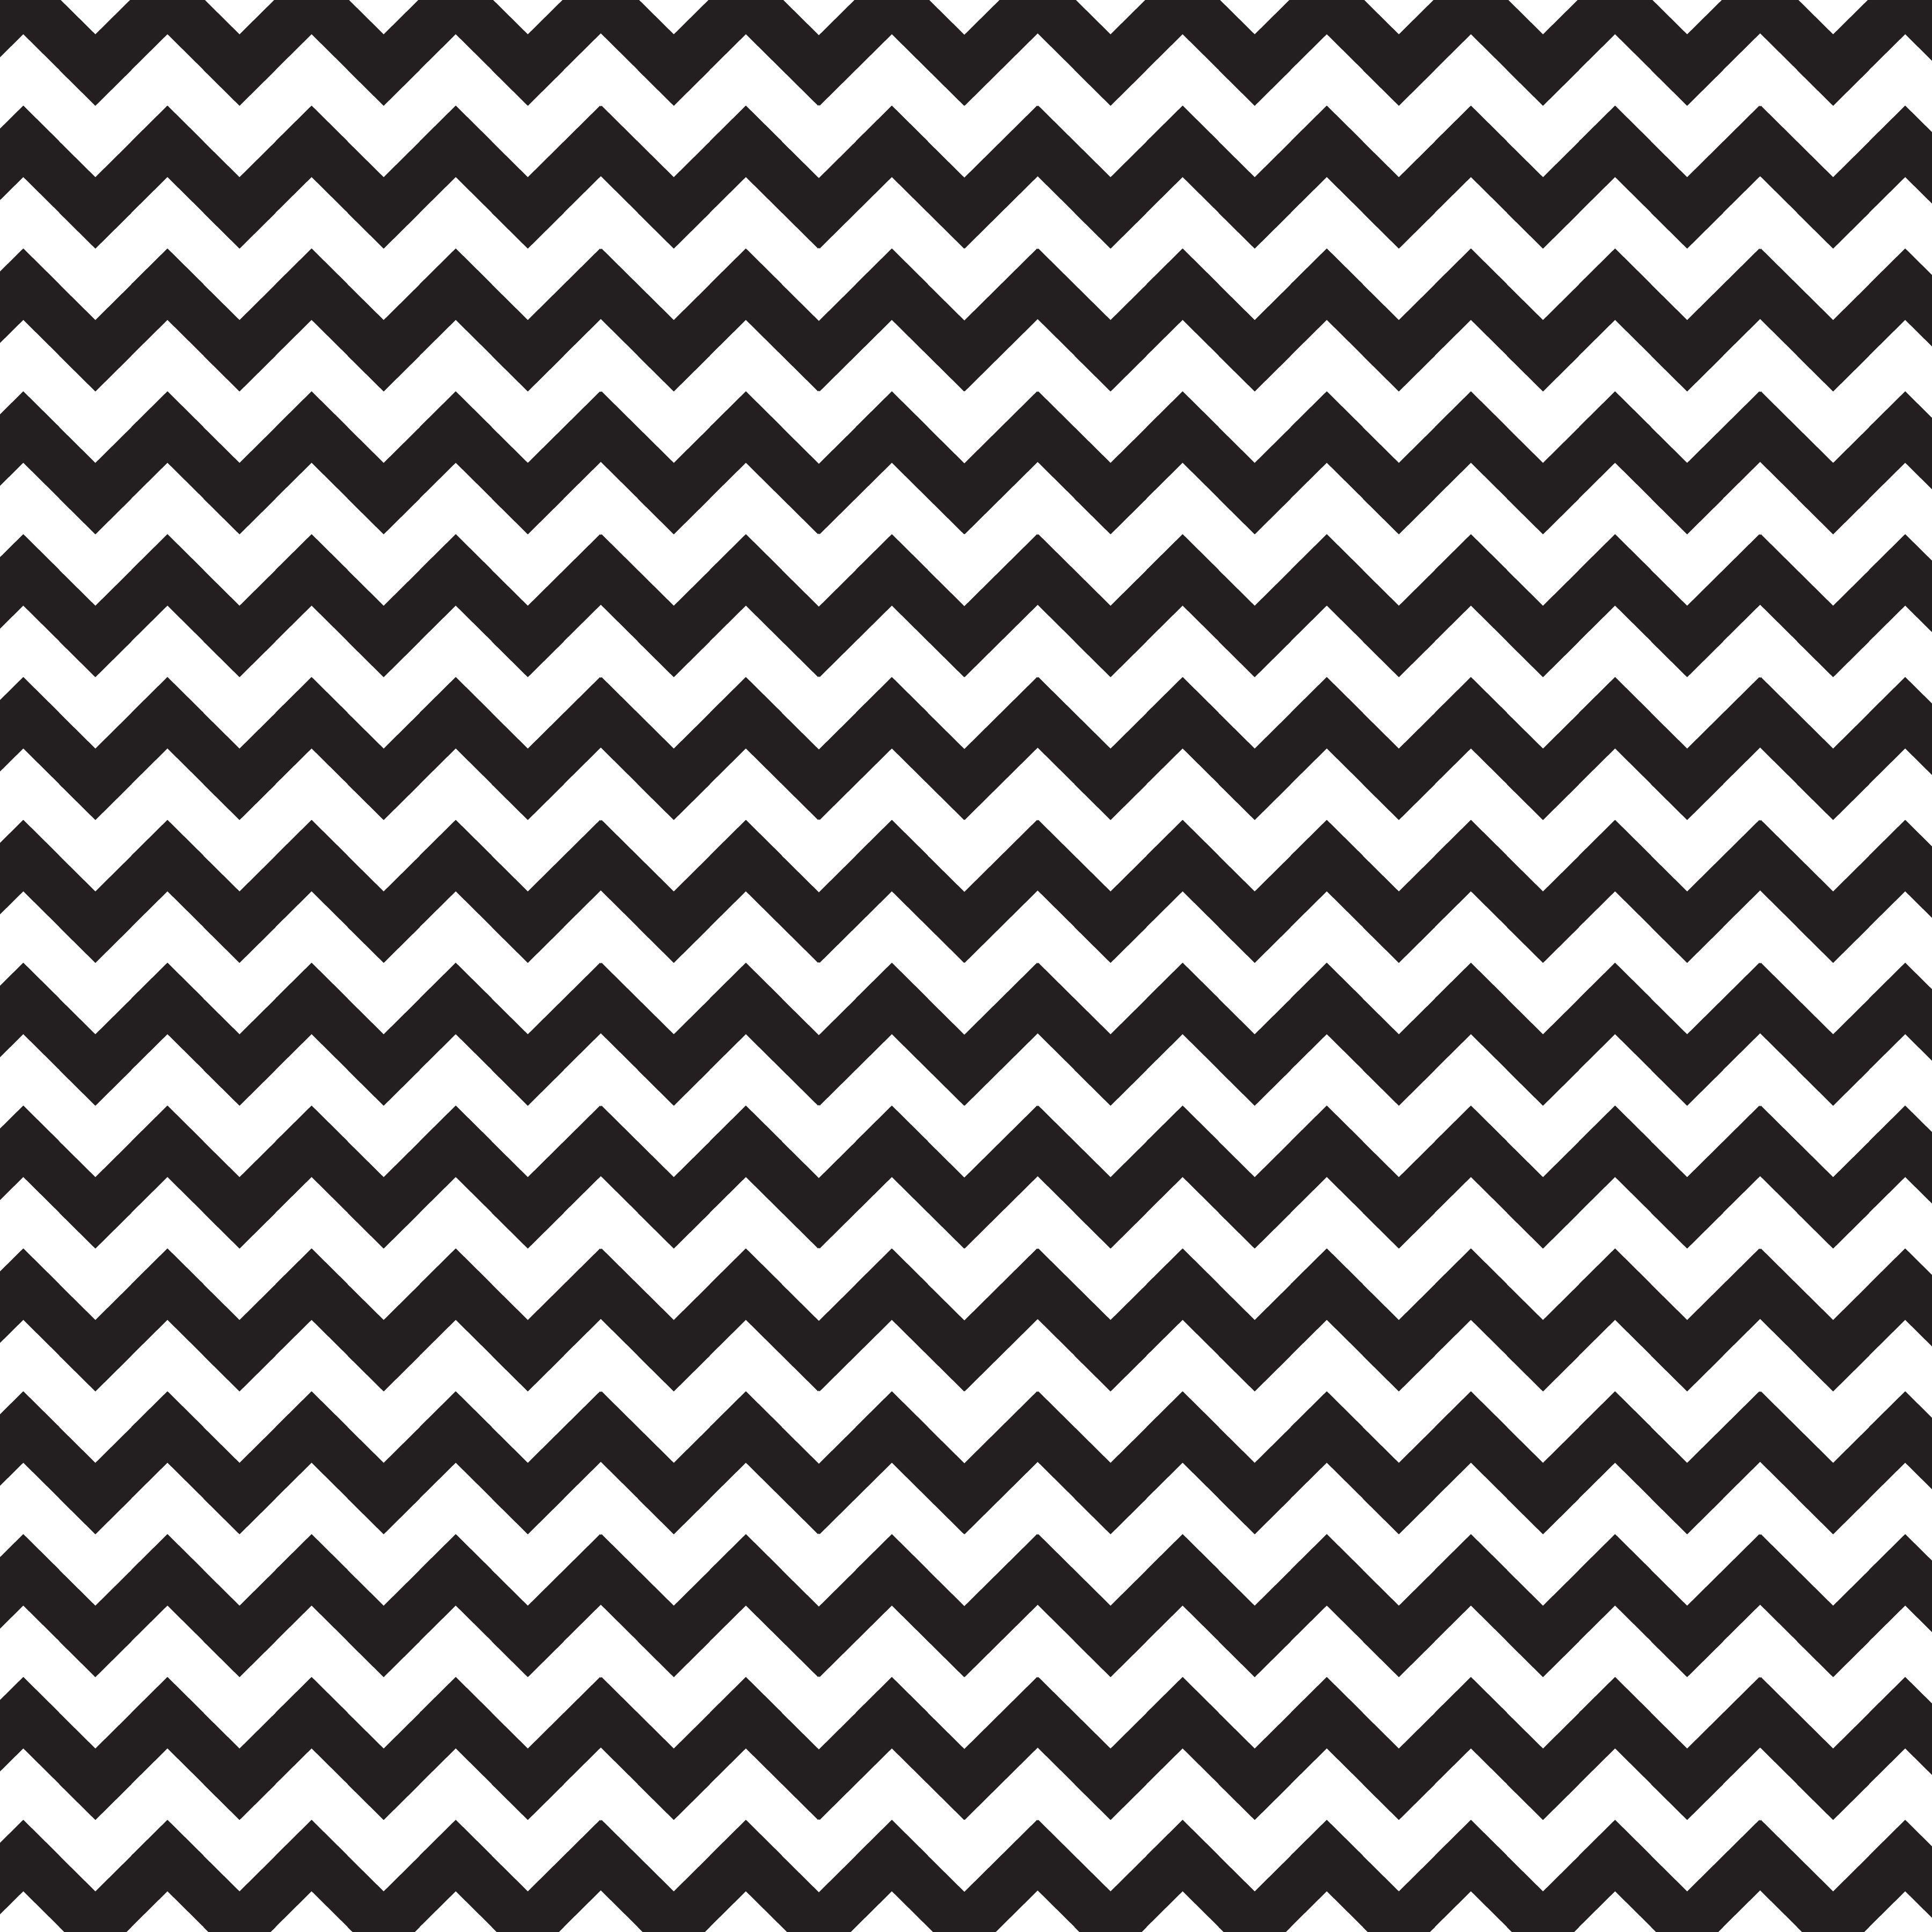 Free Printable Black And White Patterns   Black And White Chevron - Chevron Pattern Printable Free